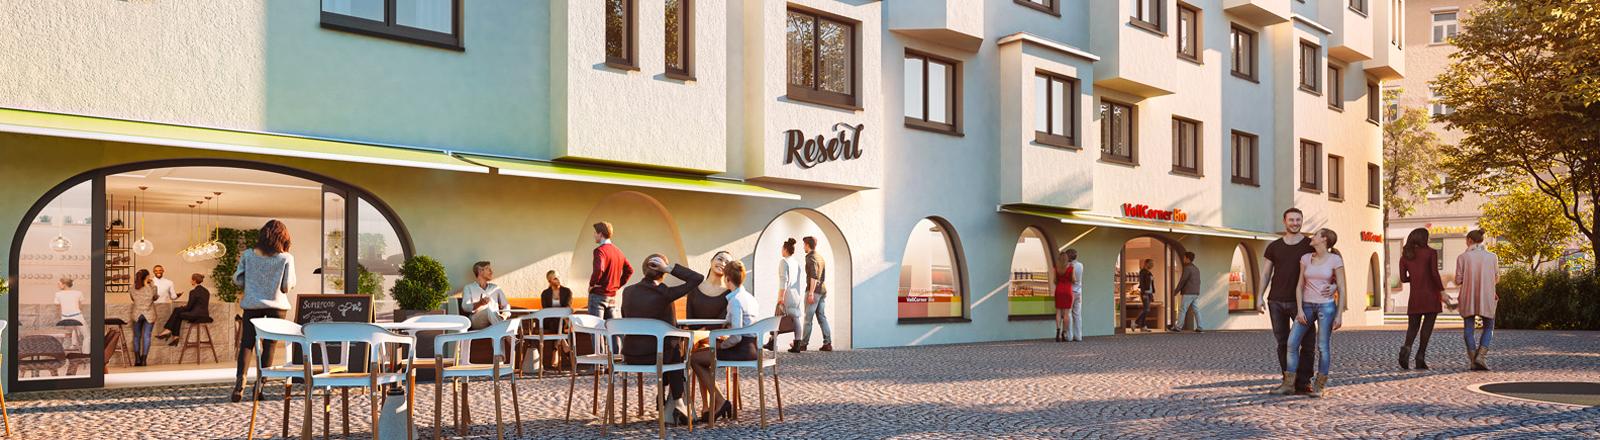 Studenten-Apartments Reserl in München